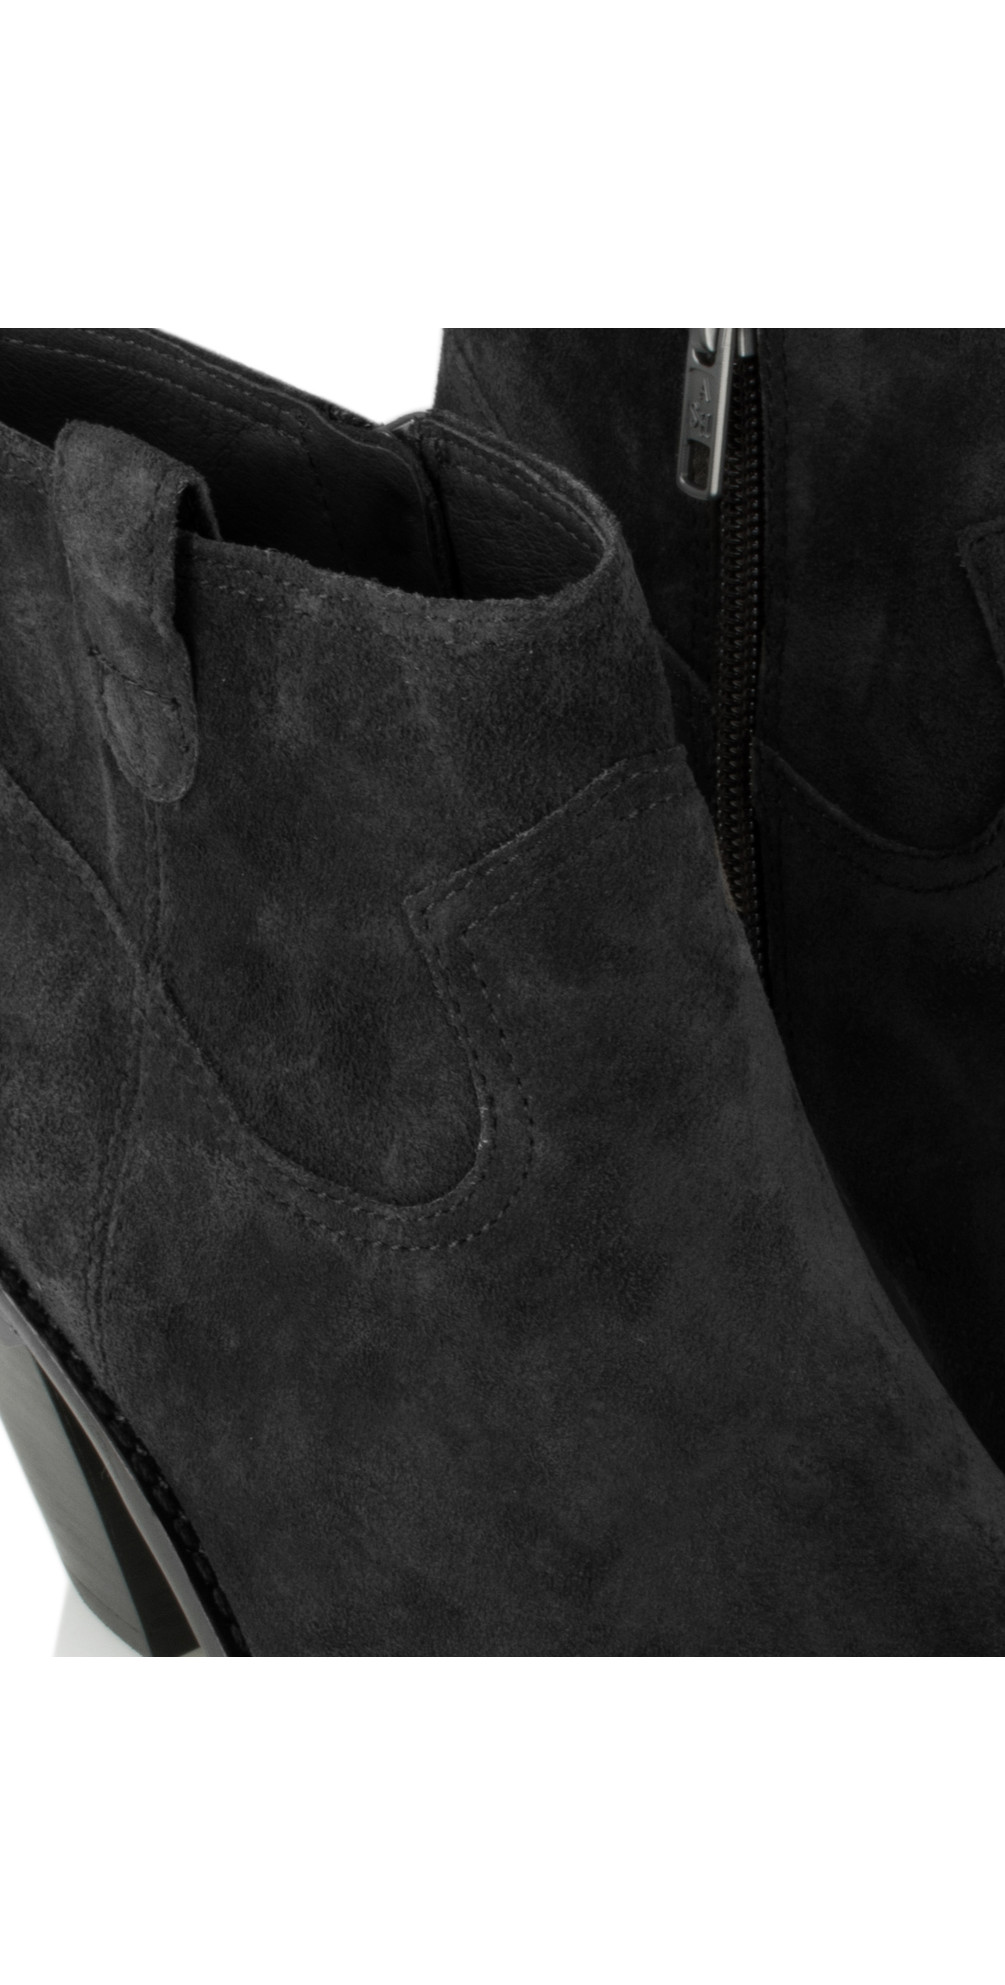 299bd8d42d6 Ash Ivana Ankle Boot in Black